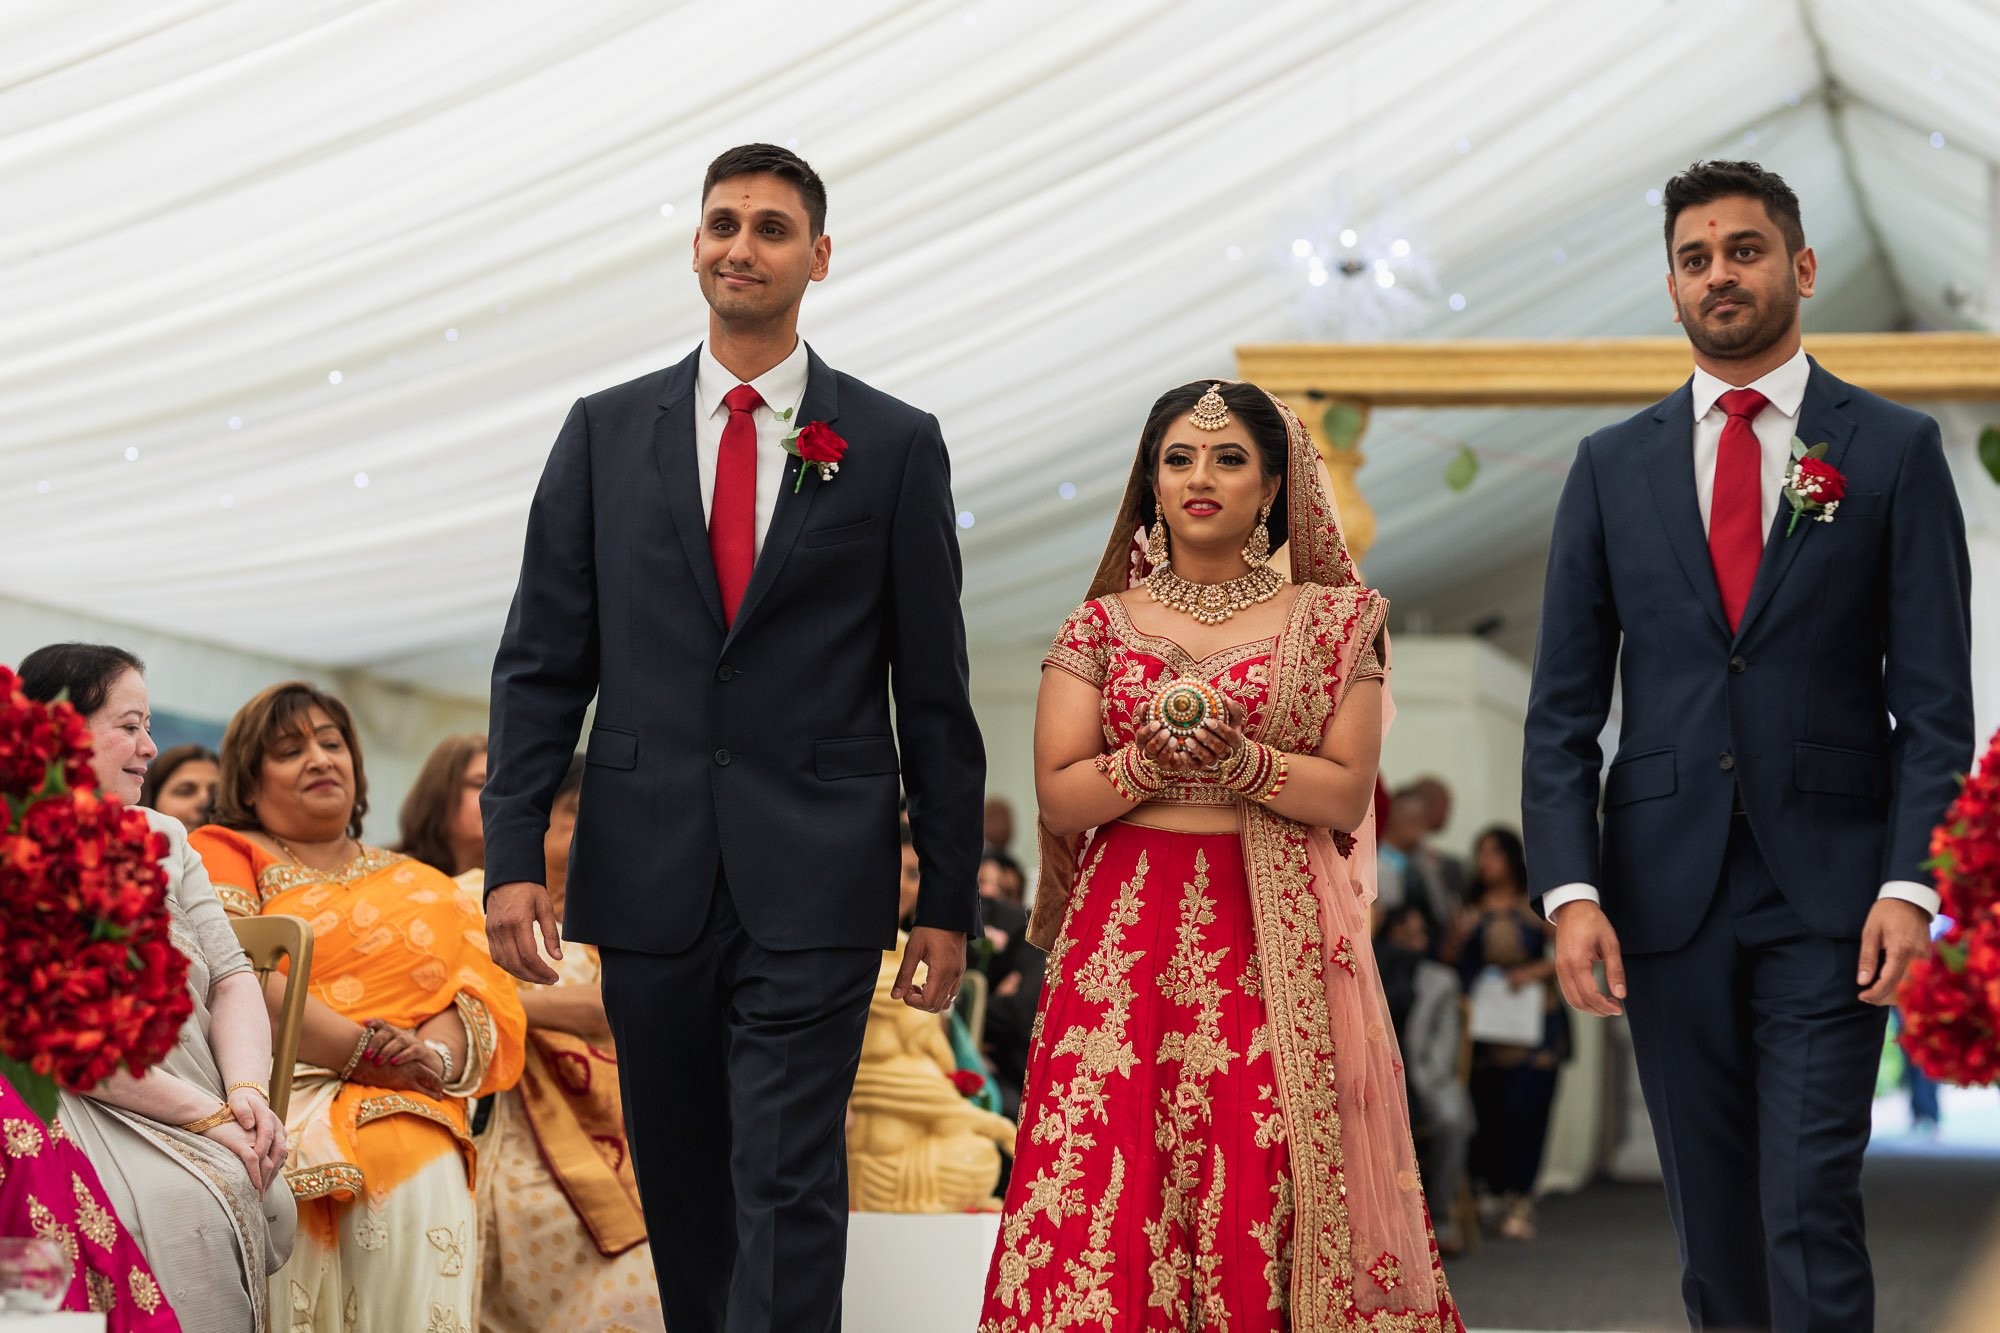 Dunchurch Park Hotel, Asian wedding photographer Midlands, bride arrival